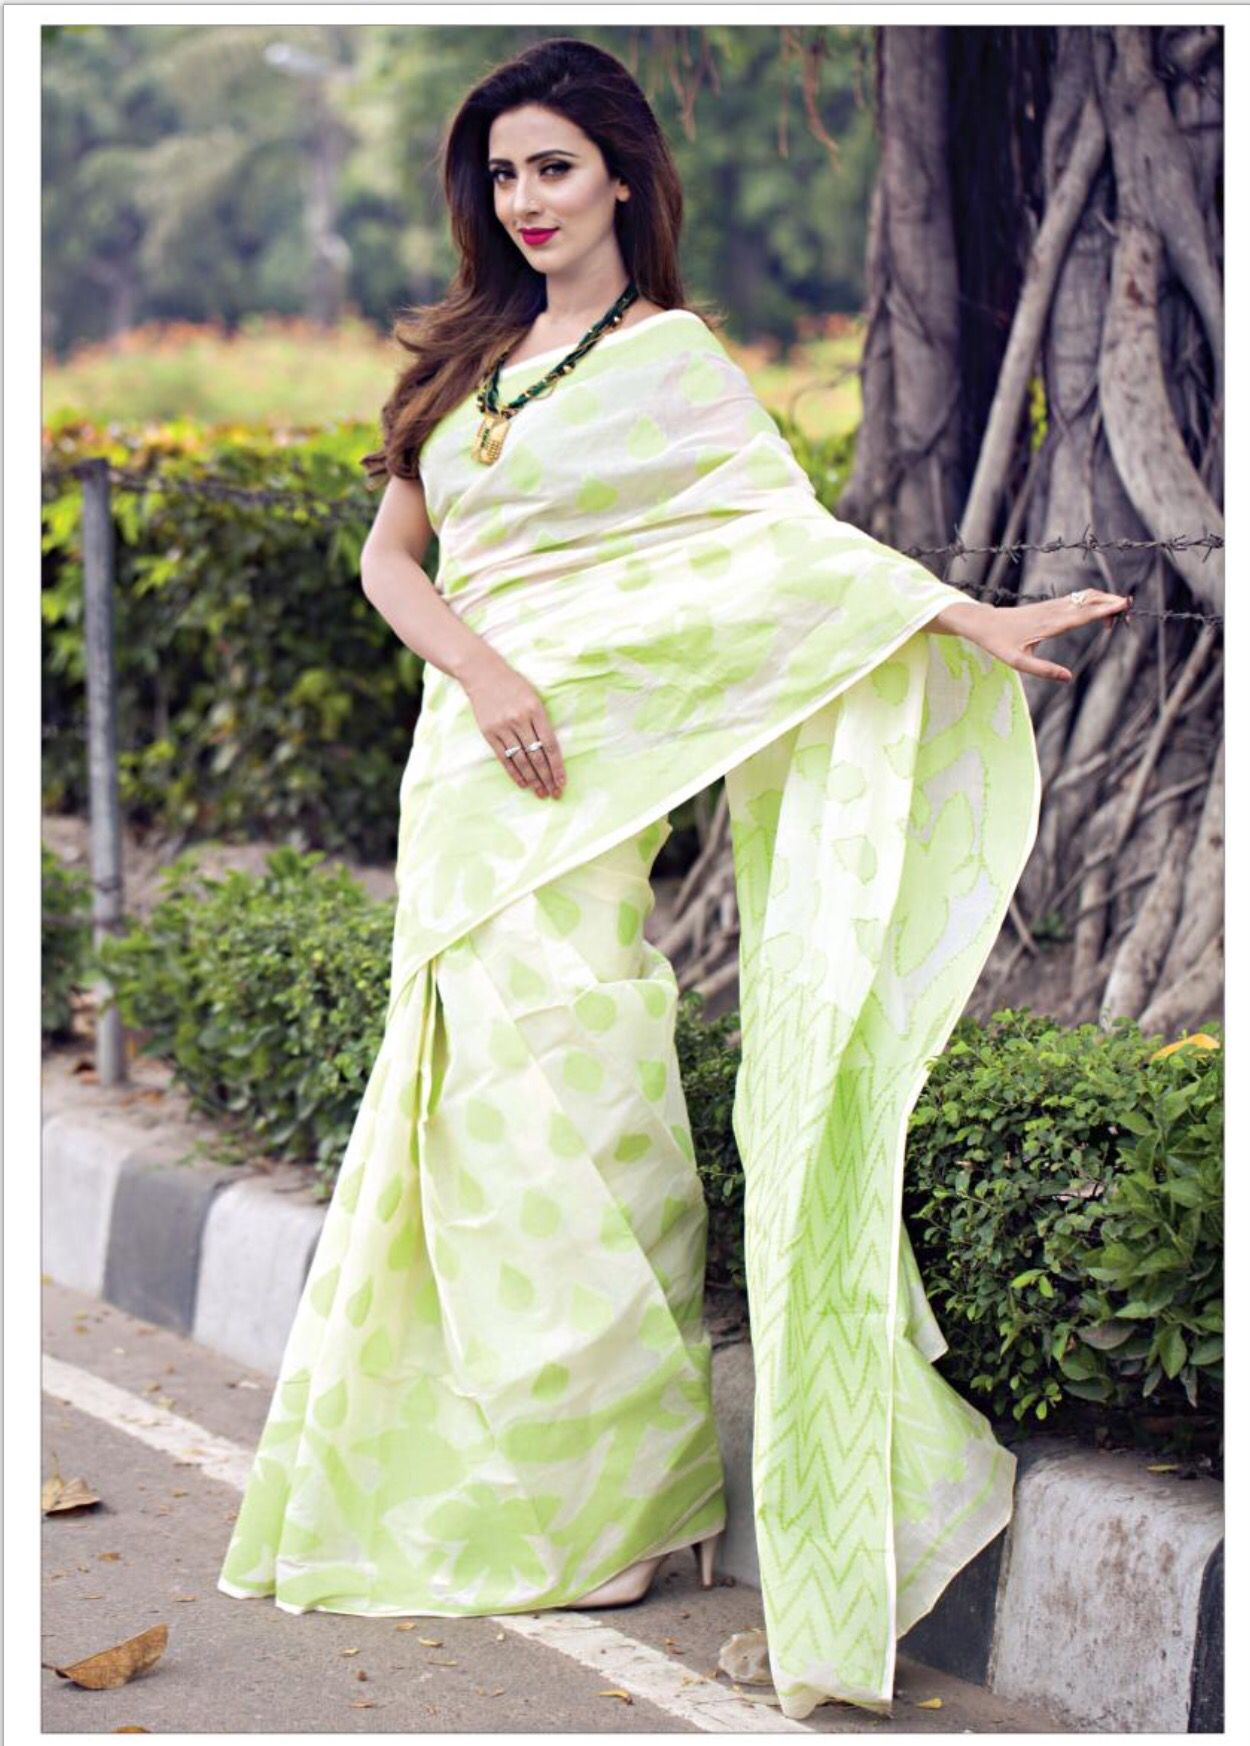 Pin On Bangladeshi Fashion And Style